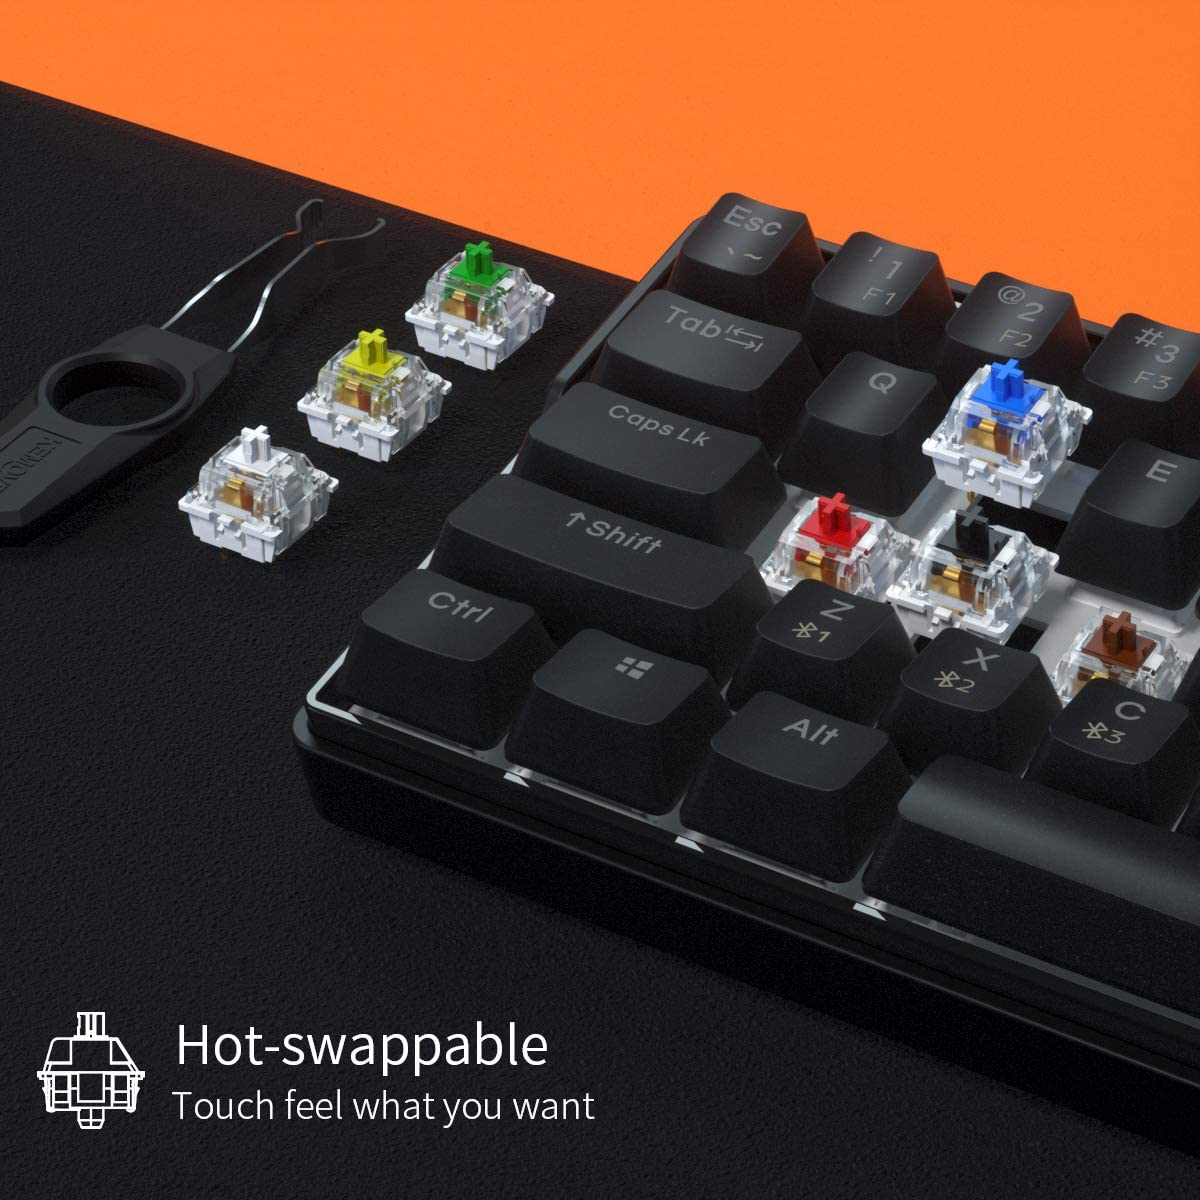 KEMOVE-لوحة مفاتيح ميكانيكية مع 61 مفتاحًا ، مفتاح 60% NKRO ، بلوتوث ، PBT ، لاسلكي ، سلكي ، للألعاب ، الكمبيوتر اللوحي ، DK61